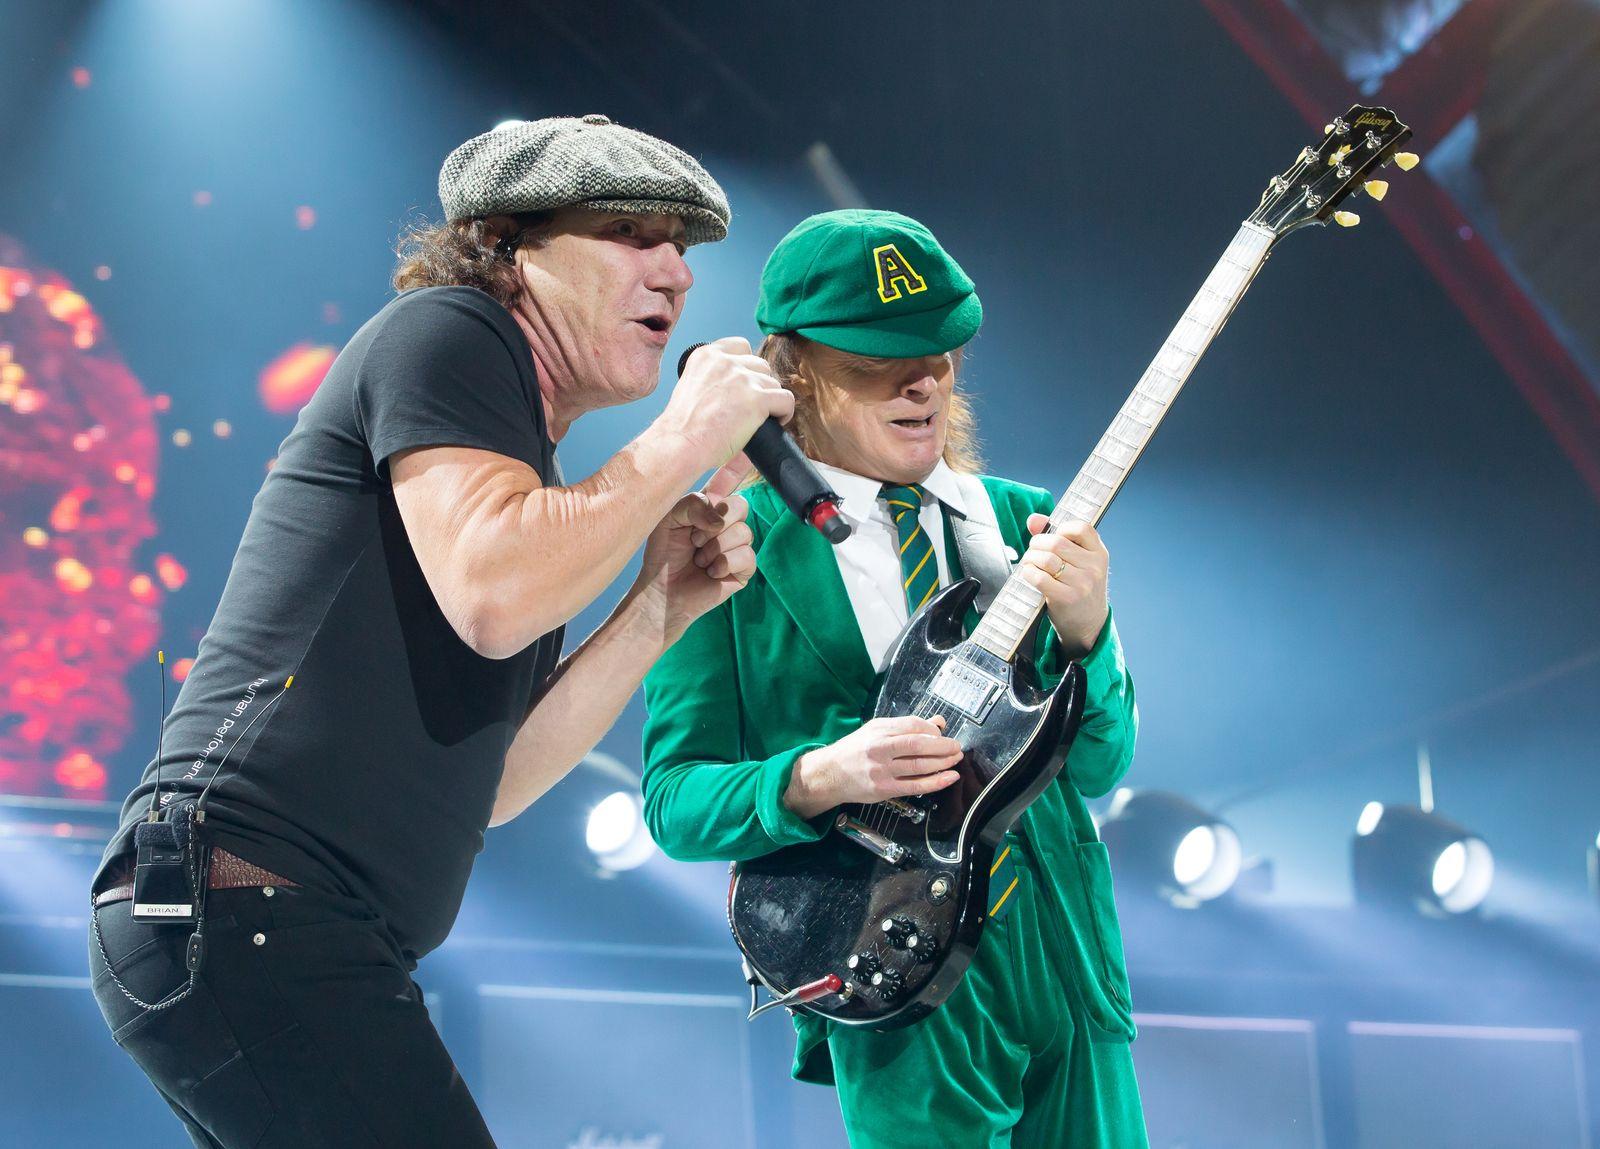 AC/DC In Concert - Kansas City, MO